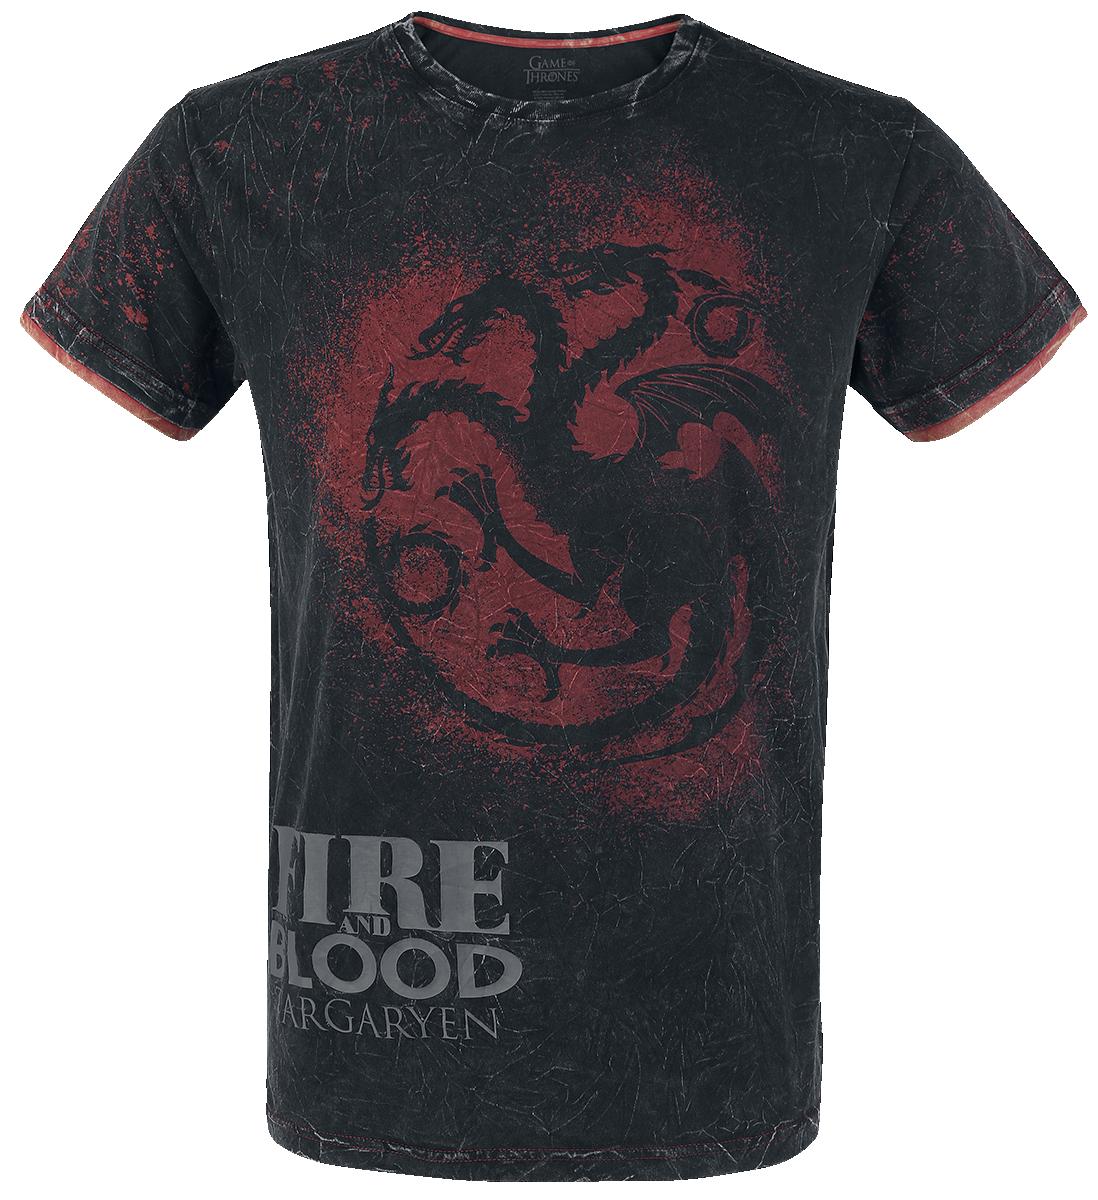 Game of Thrones - Targaryen - Fire And Blood - T-Shirt - dark grey image